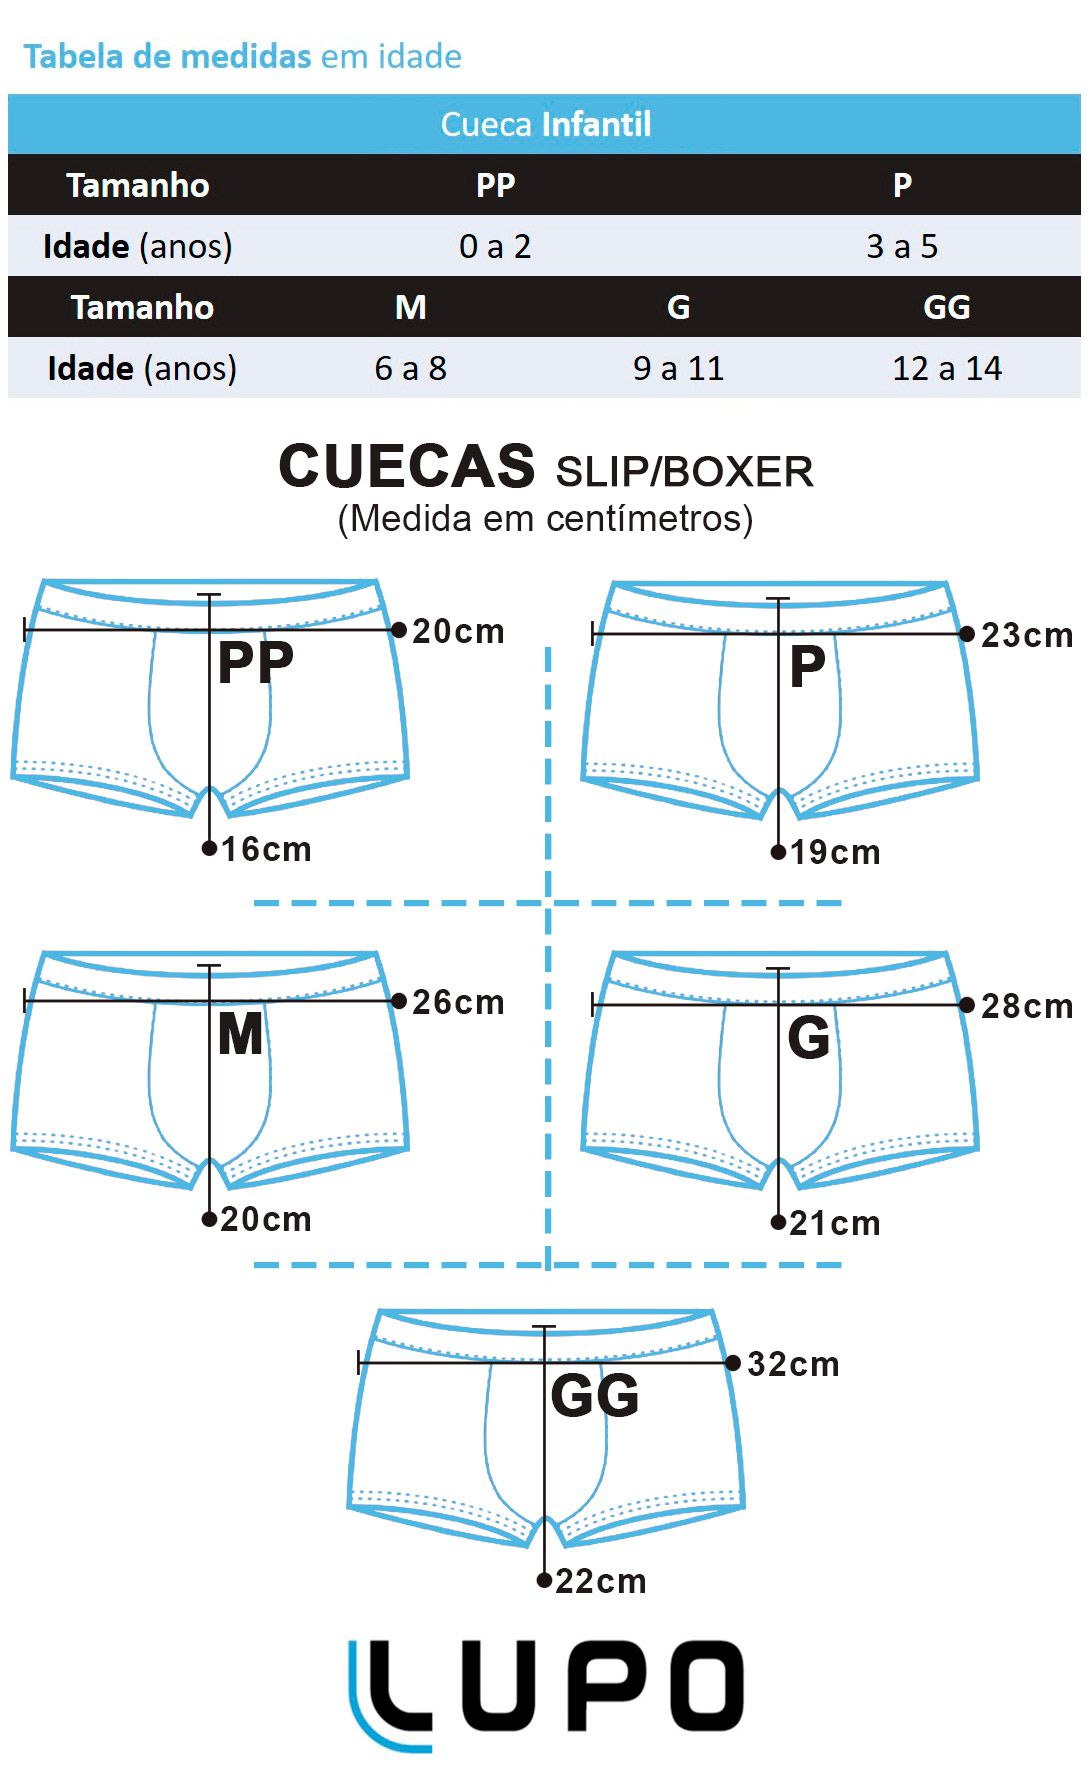 Cueca Infantil Slip Kit 9 cuecas Lupo